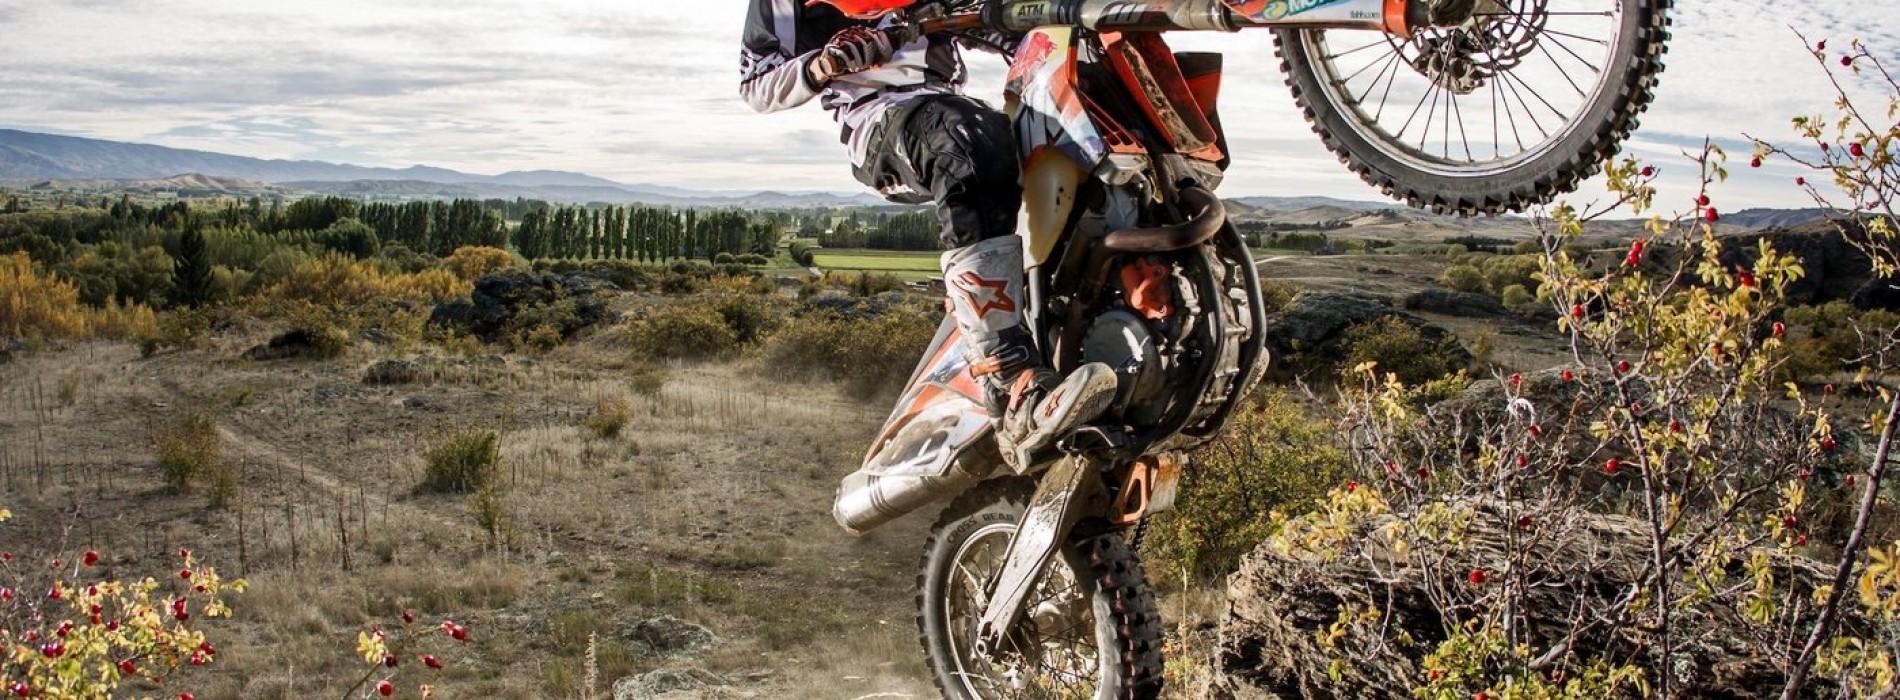 Racing Dirt to Road Episode 3: Chris Birch